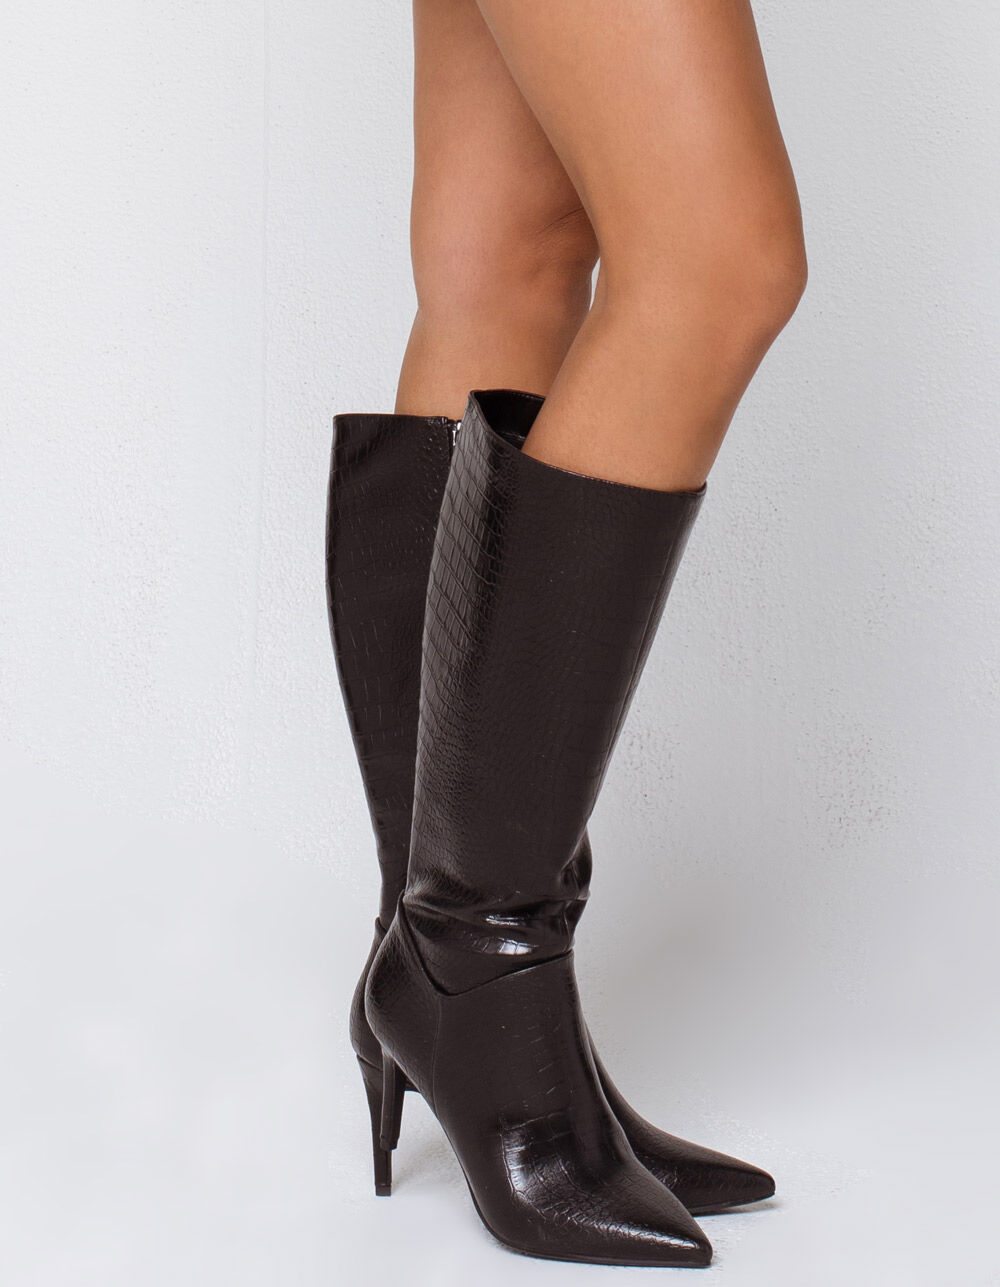 DELICIOUS Crocodile Knee High Black Boots